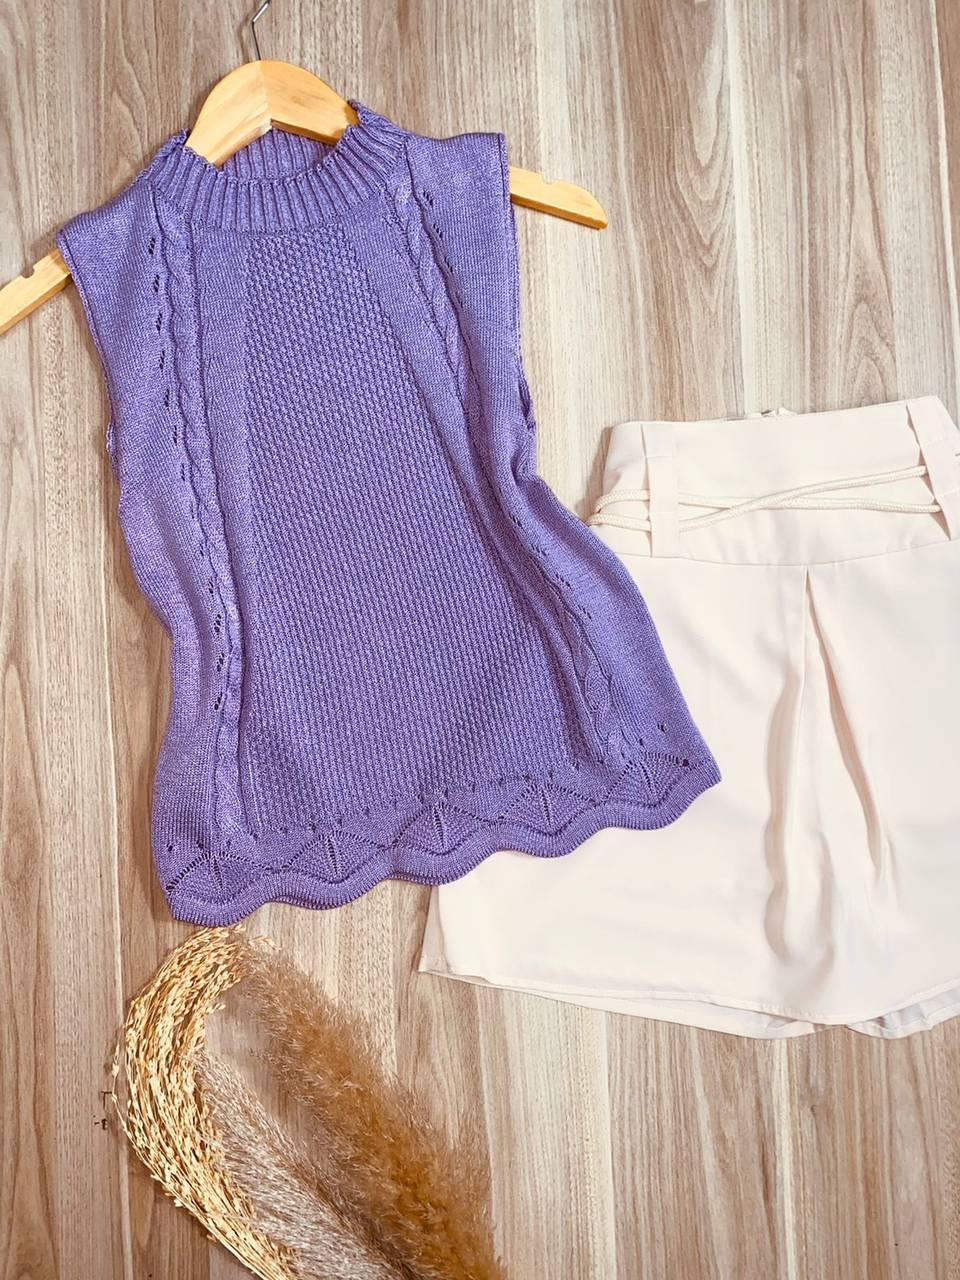 Blusa Regata Tricot Tranças Beatriz Fashion